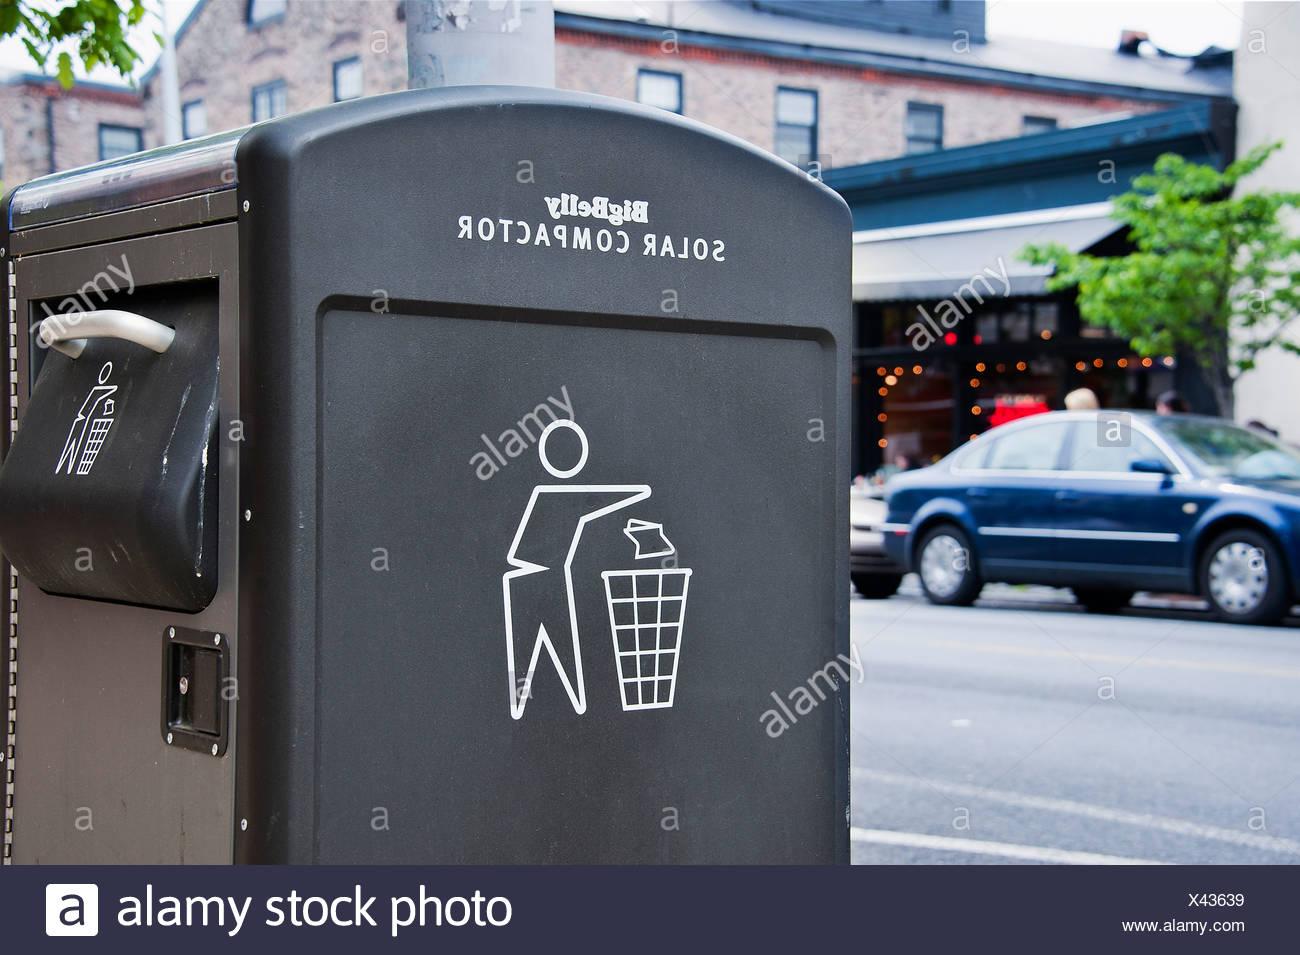 Public solar compactor trash receptacle, Manayunk, PA, USA - Stock Image